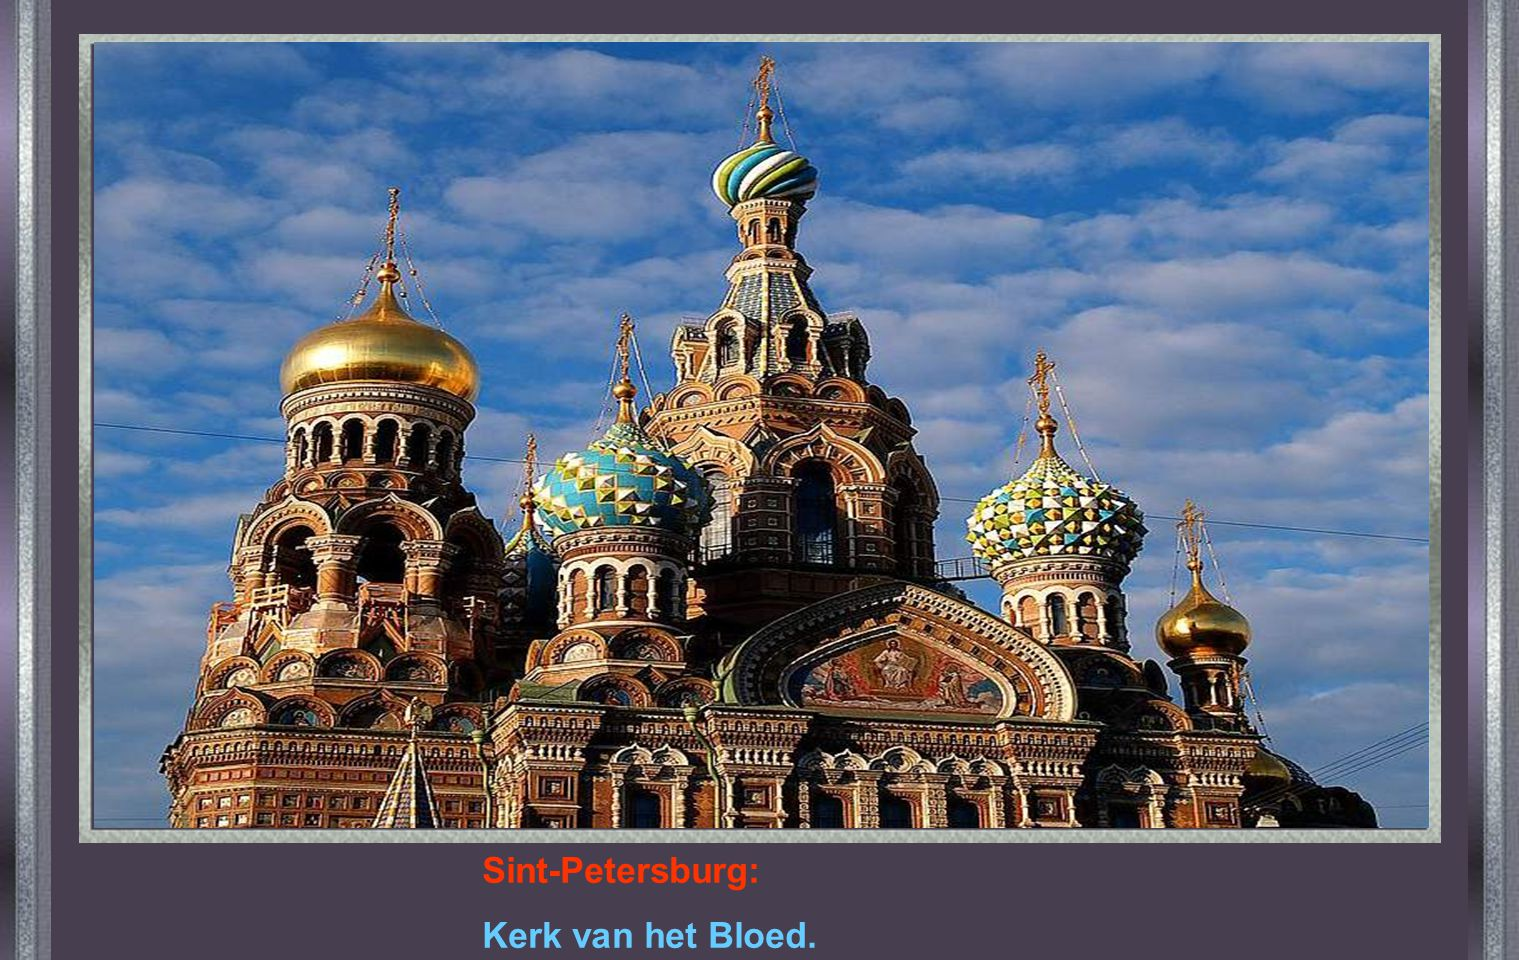 Sint-Petersburg: Kerk van het Bloed.